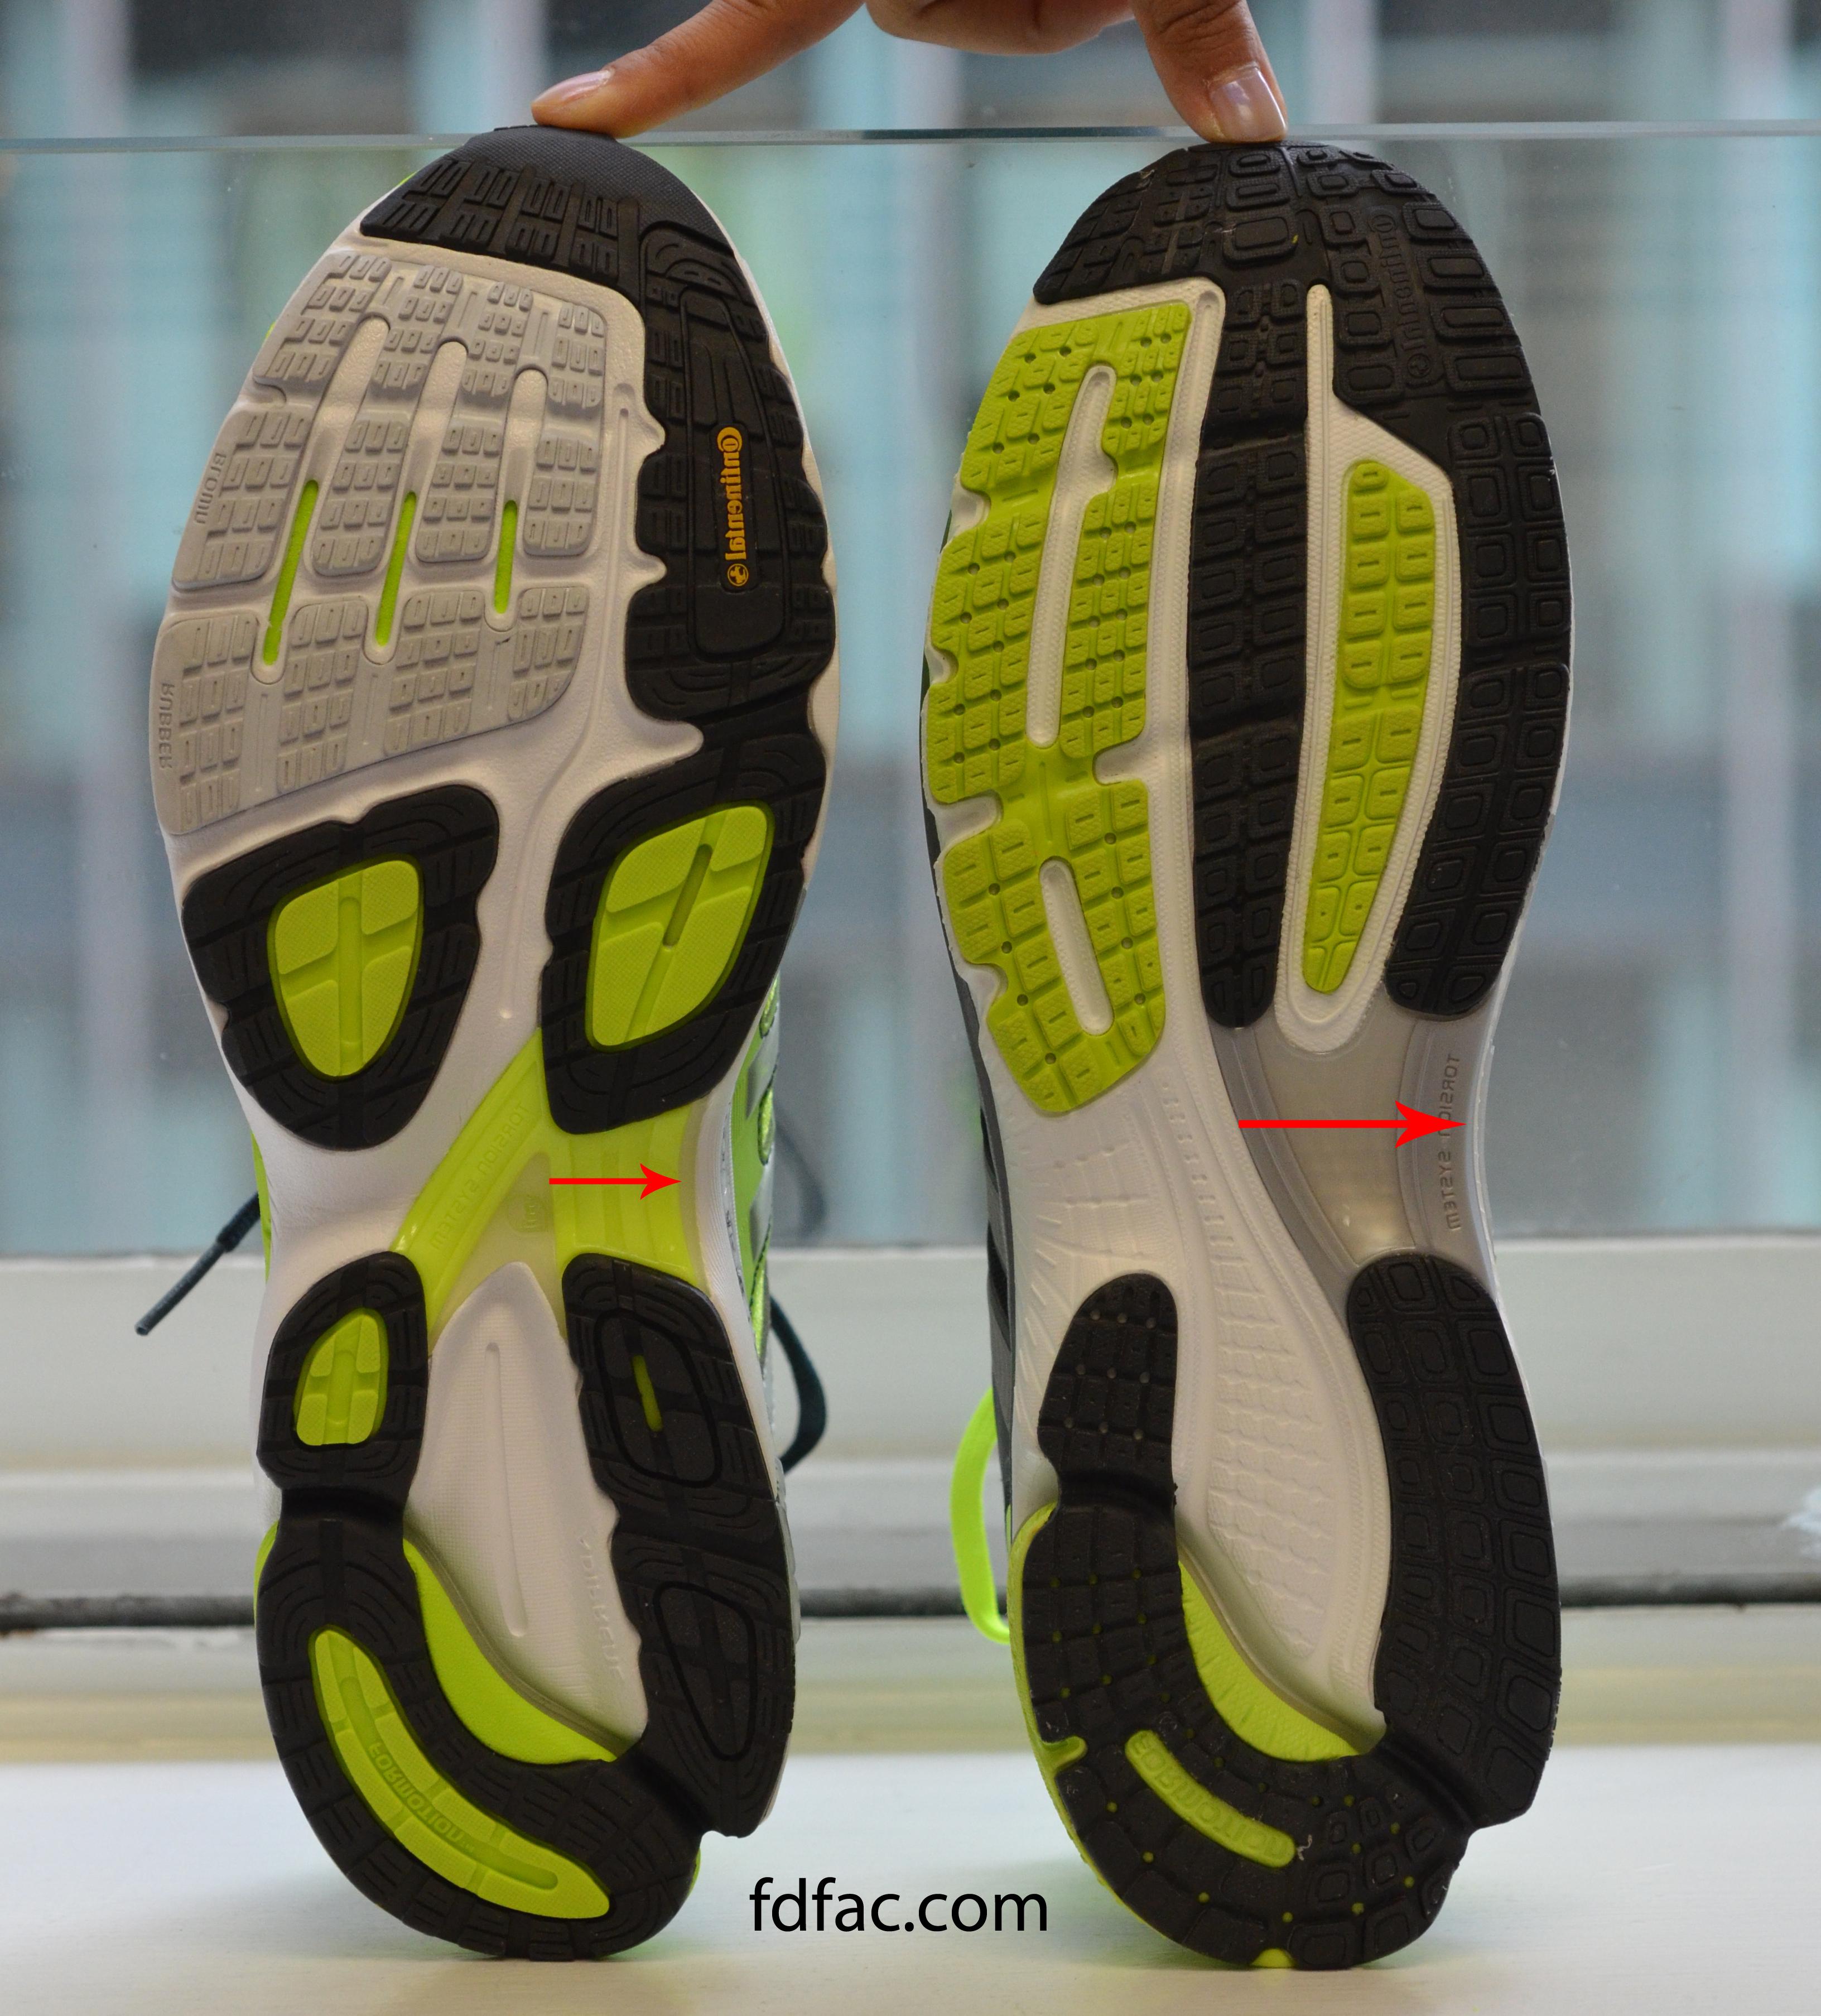 adidas 6 5. adidas_supernova_bottom adidas 6 5